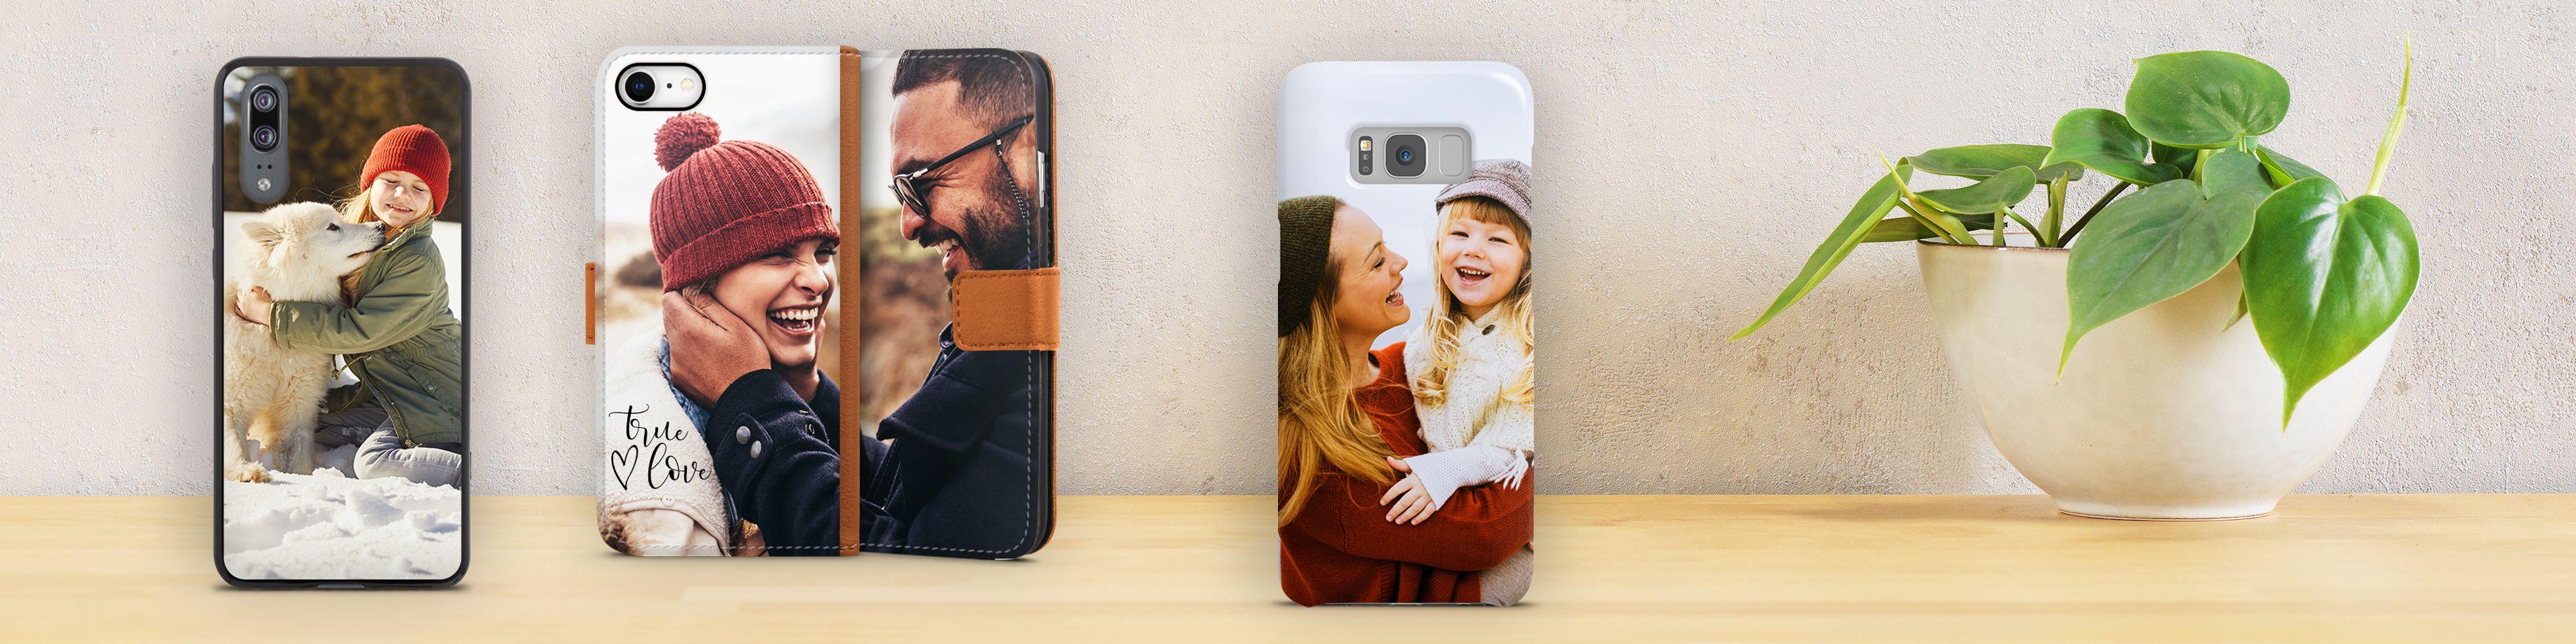 Handyhüllen mit Foto online selbst gestalten | CEWE